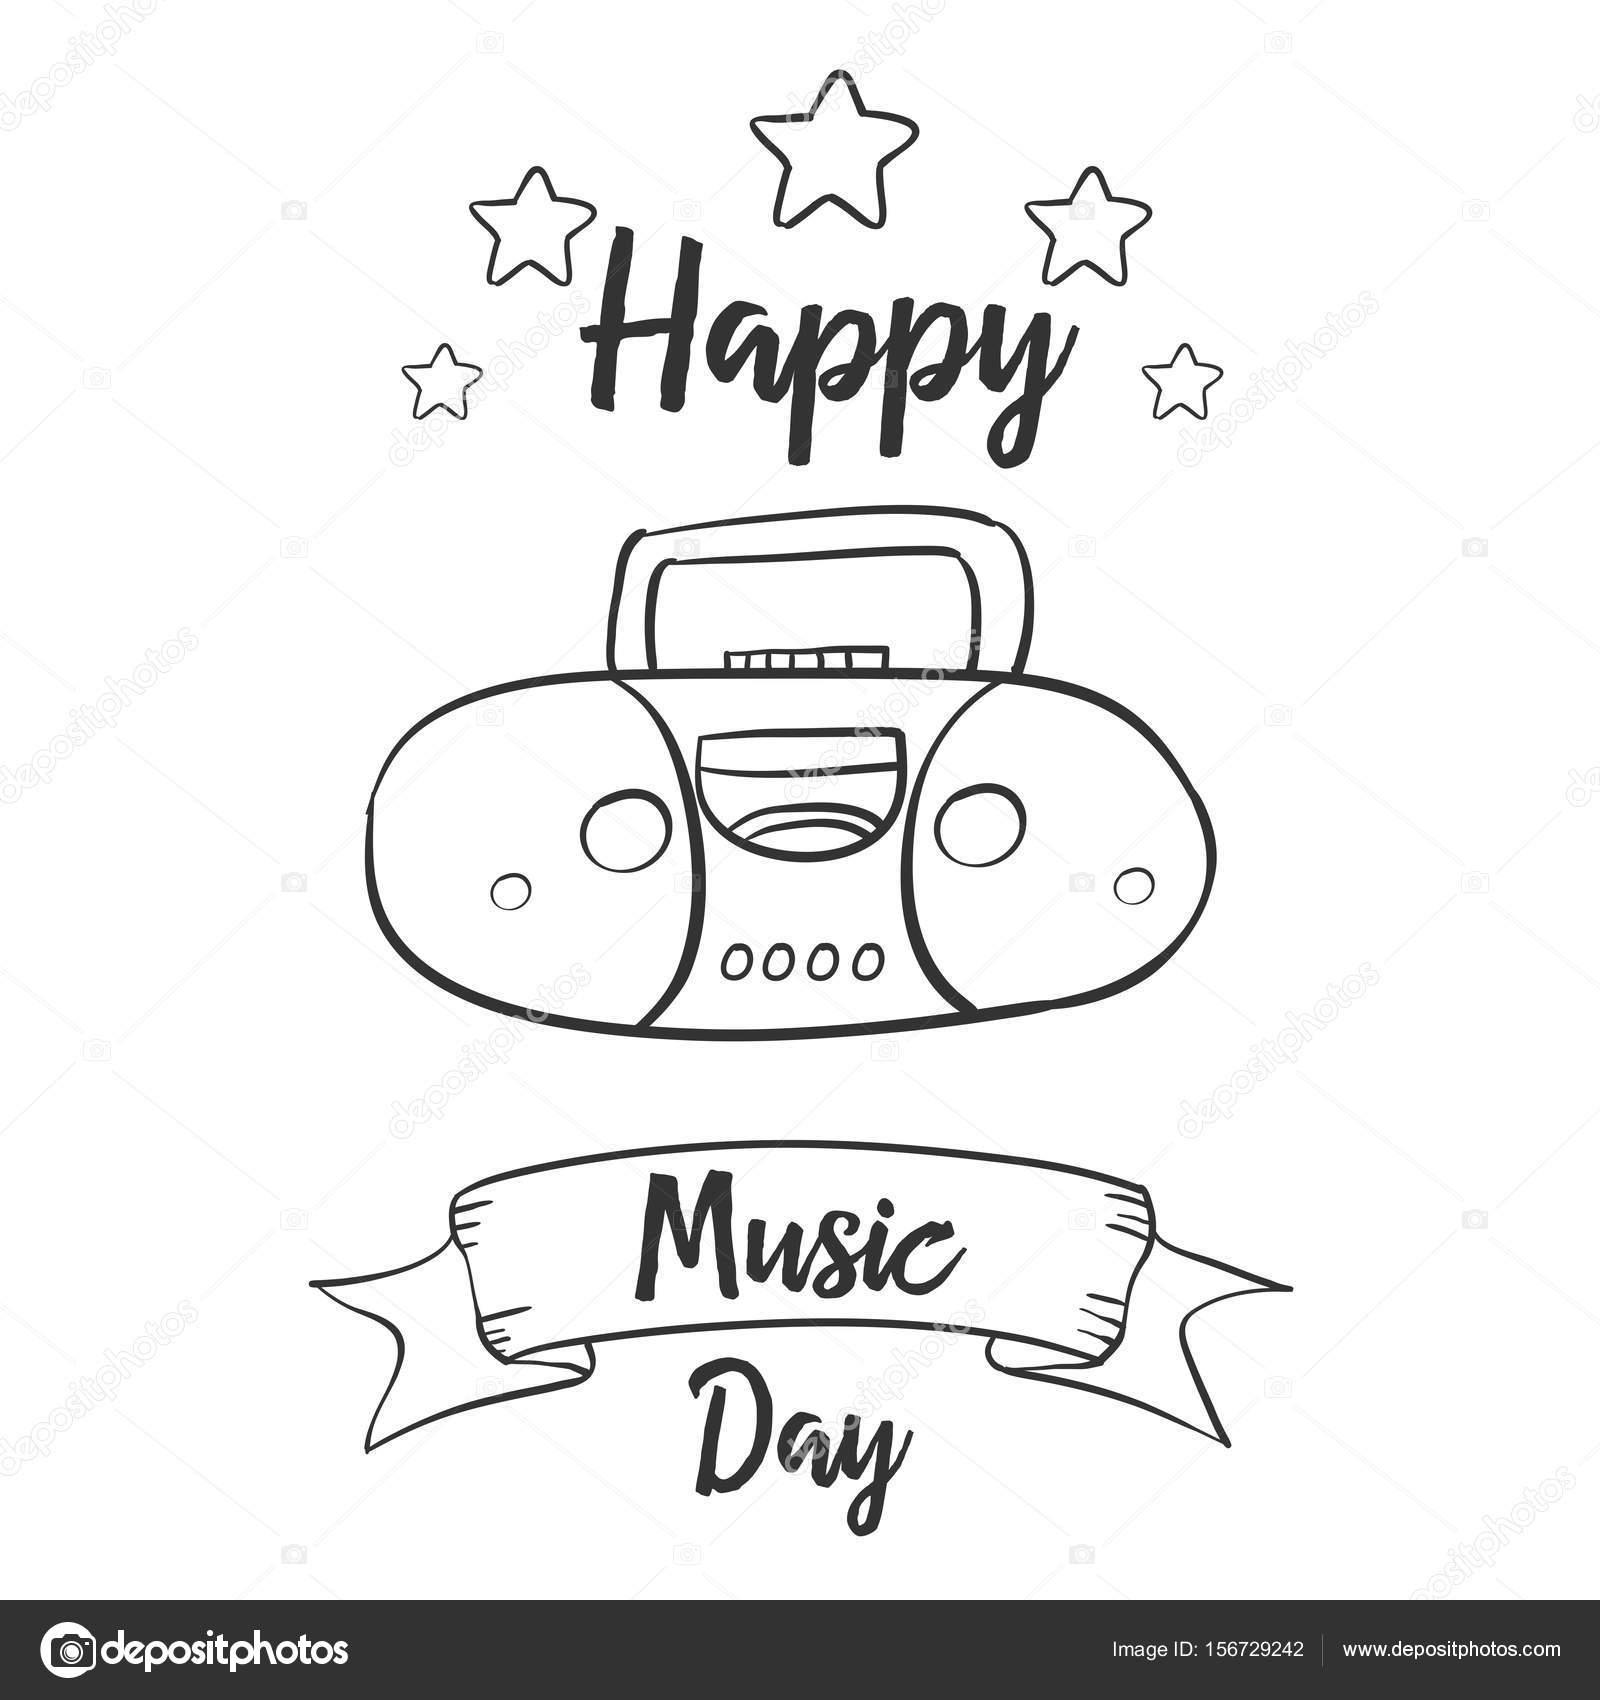 Dibujos Musica Para Dibujar Mano Dibujar Arte Vector Música